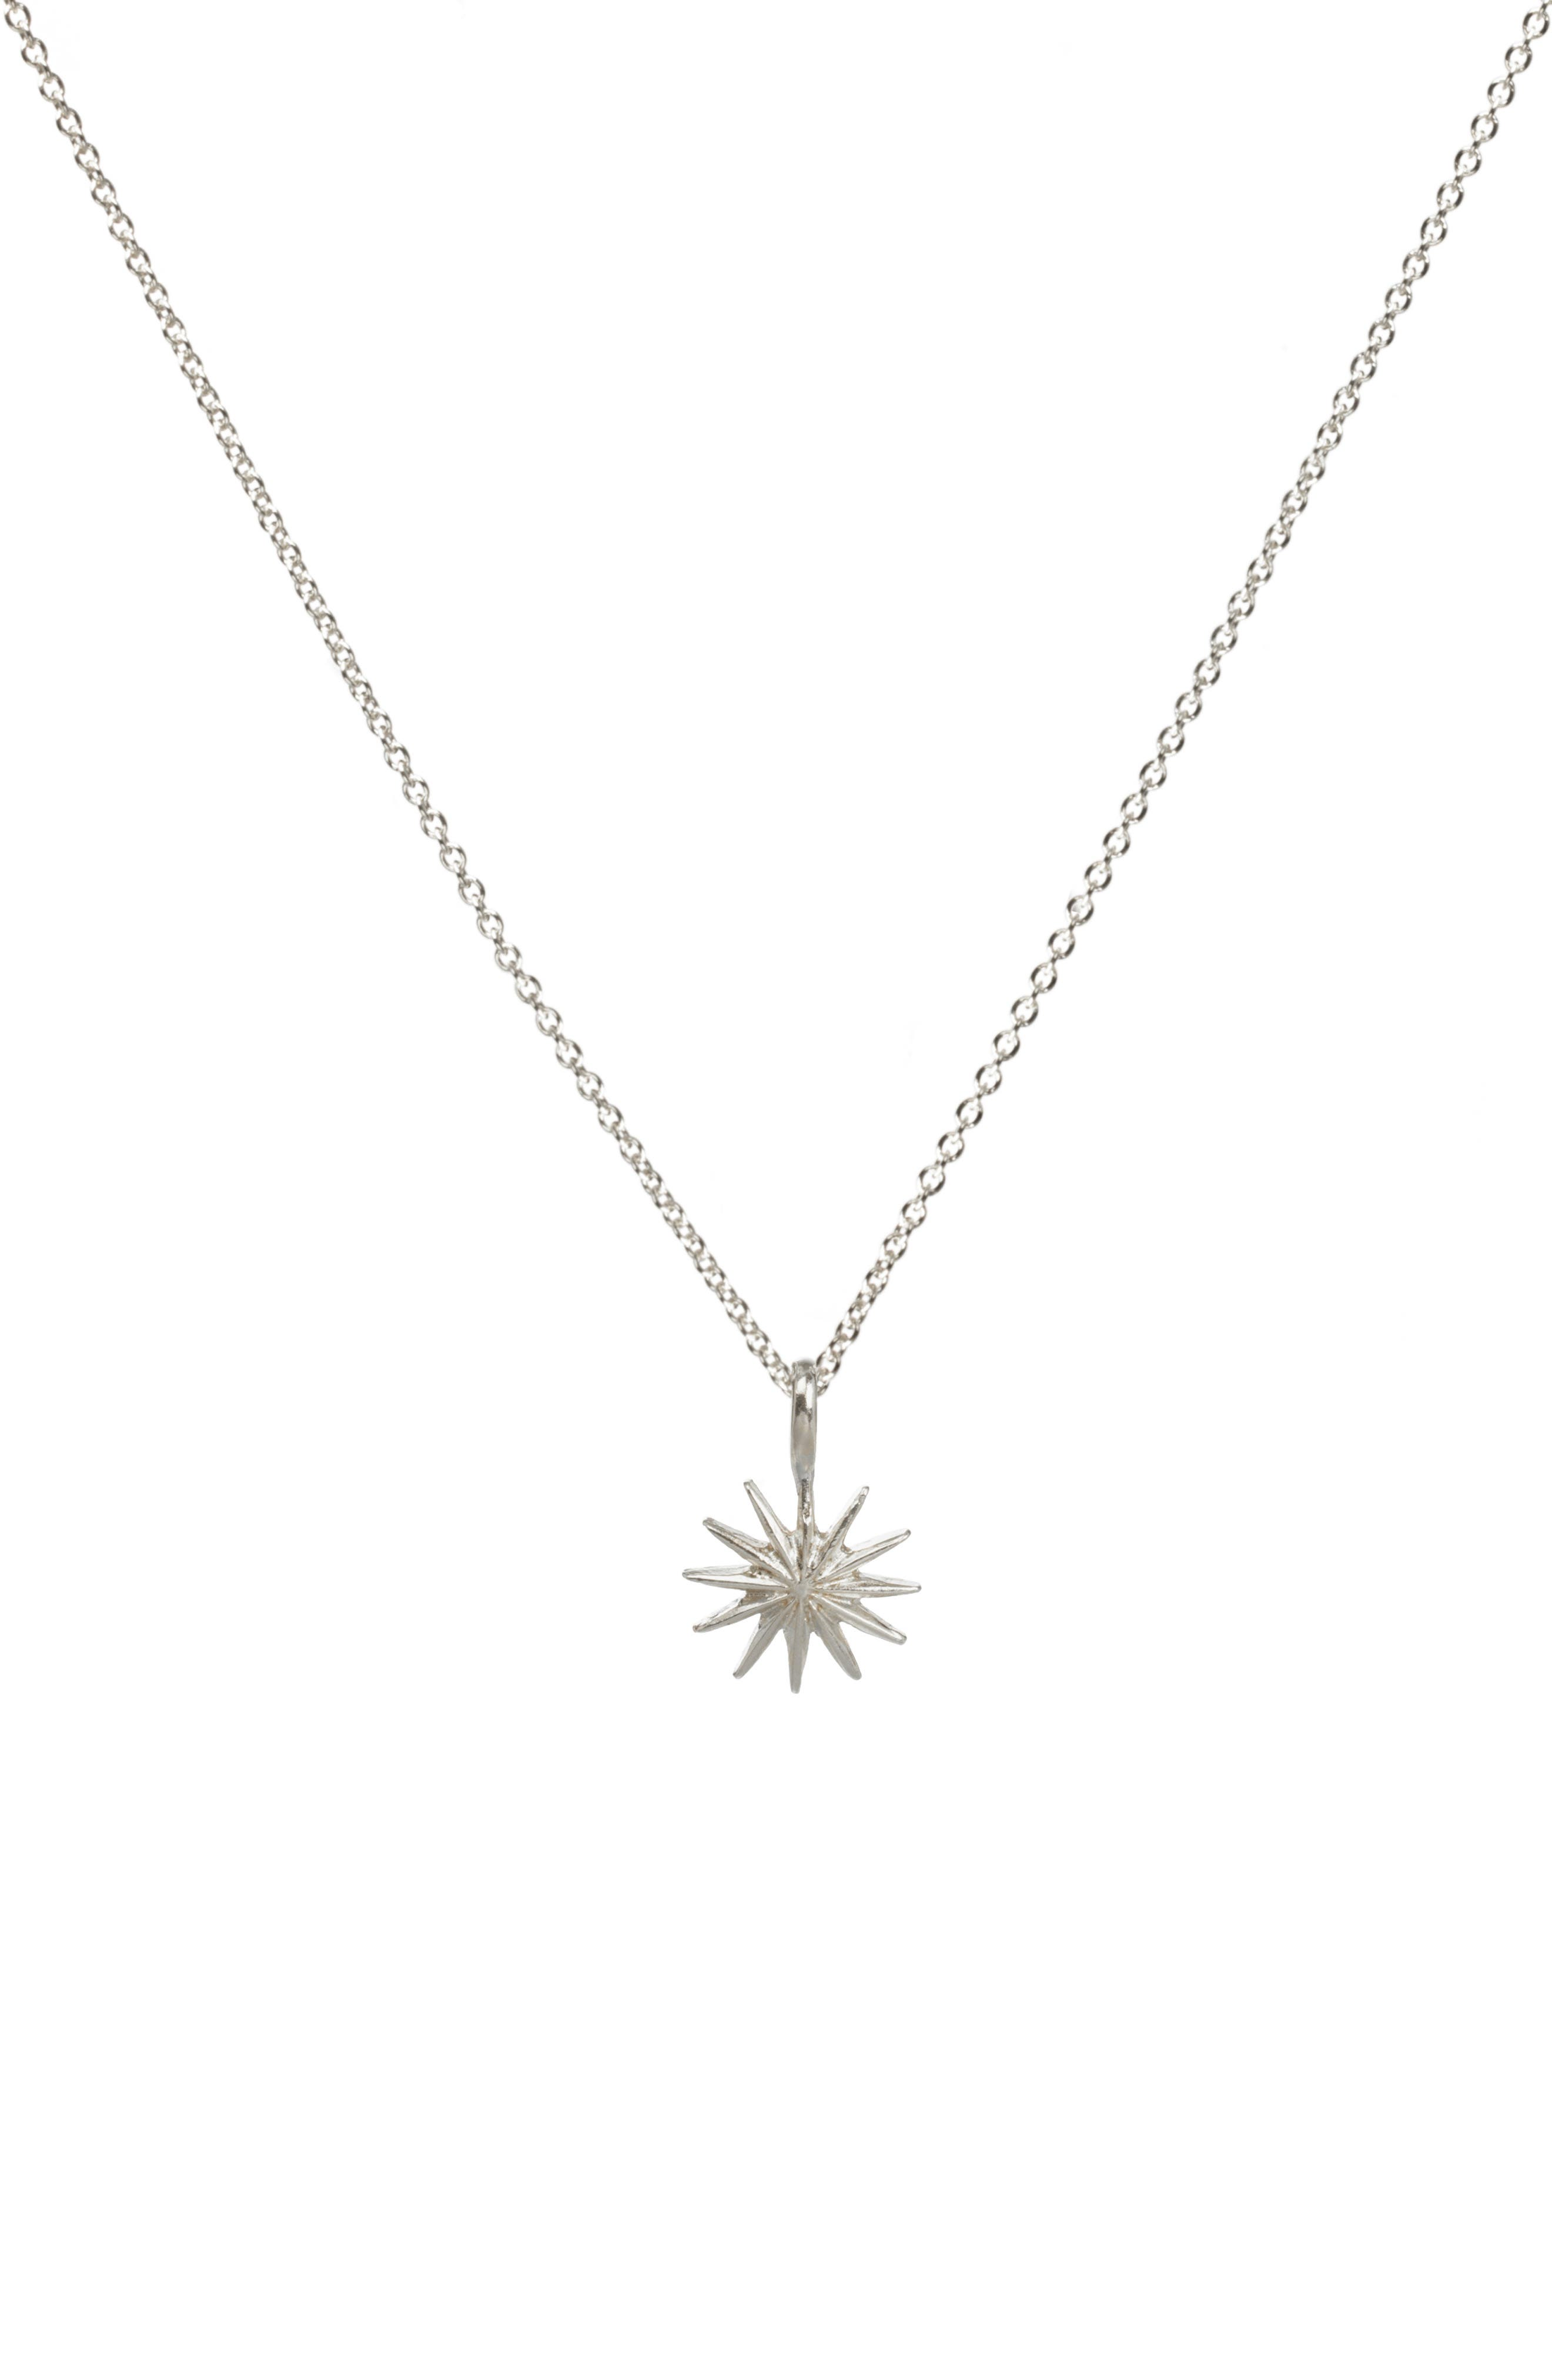 Starburst Pendant Necklace,                             Alternate thumbnail 4, color,                             041